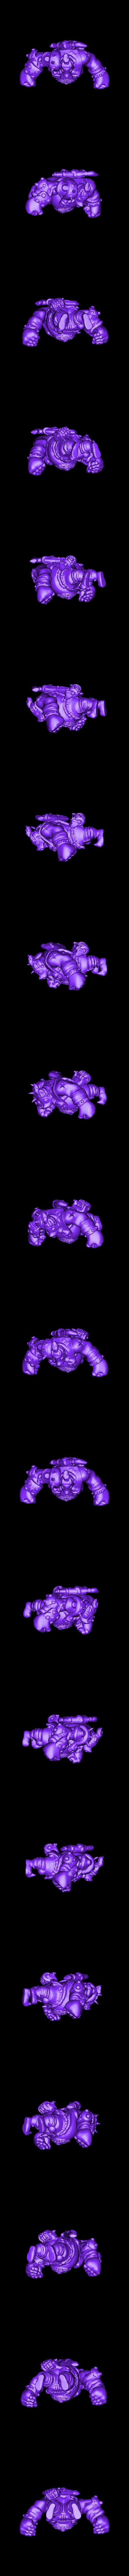 Roadhog.stl Download free STL file Keshiverse - Roadhog (Overwatch) • 3D printer design, whackolantern